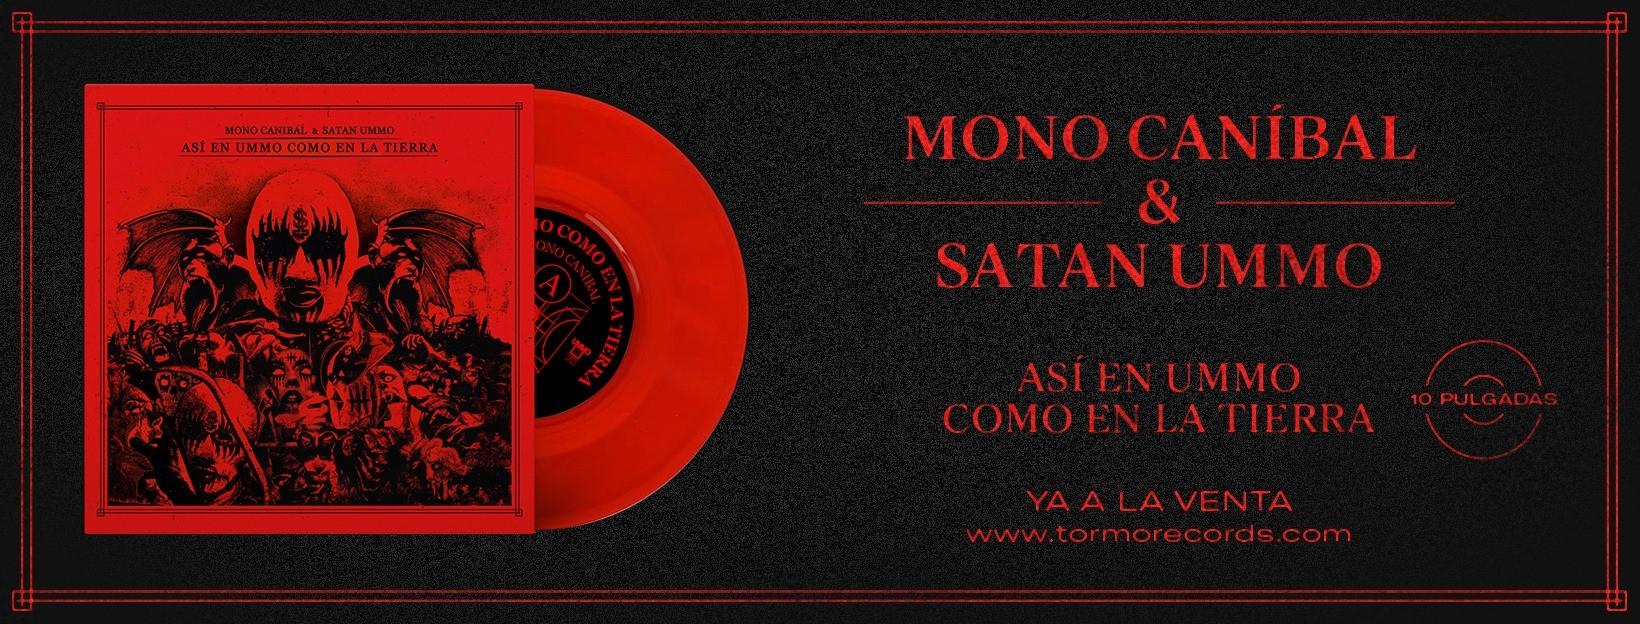 Mono Canibal & Satan Ummo